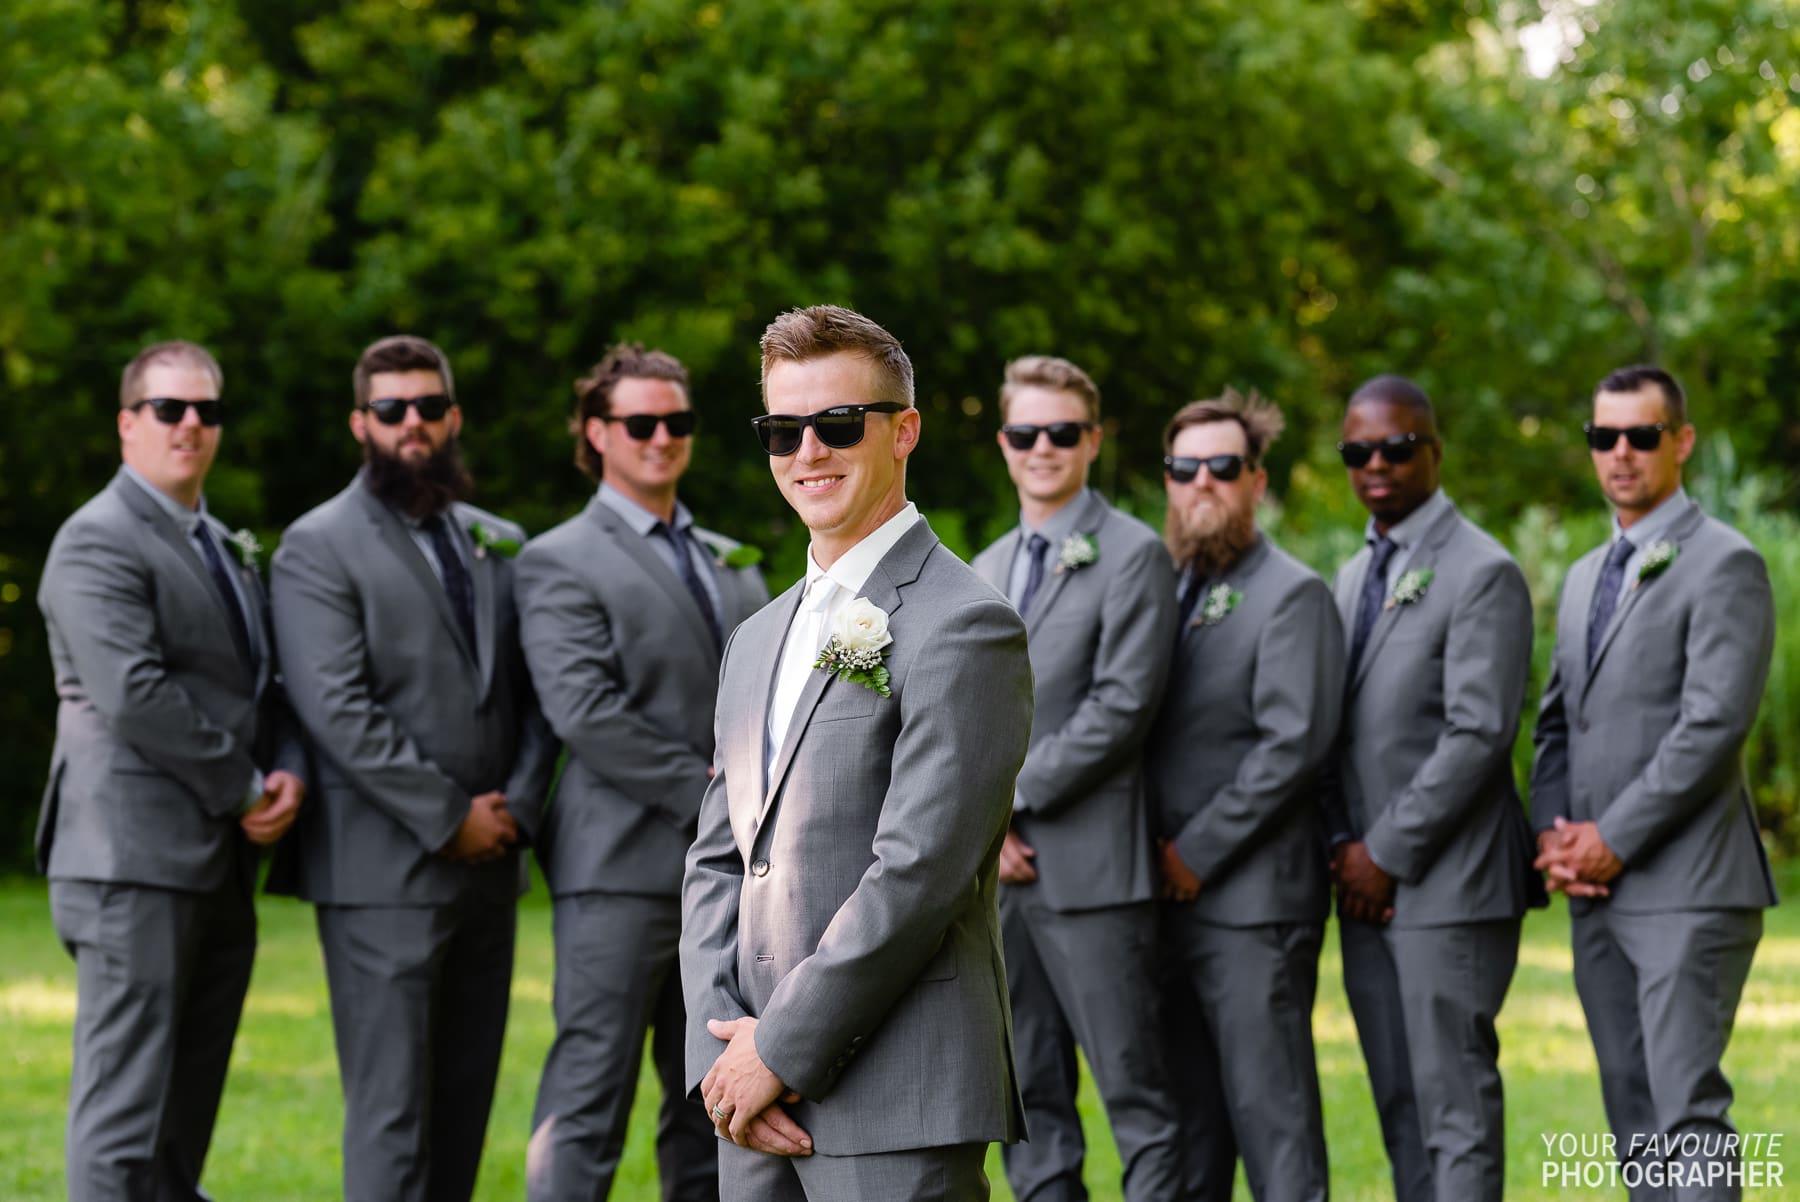 Sam & Josh's backyard wedding photos in Courtice, Ontario